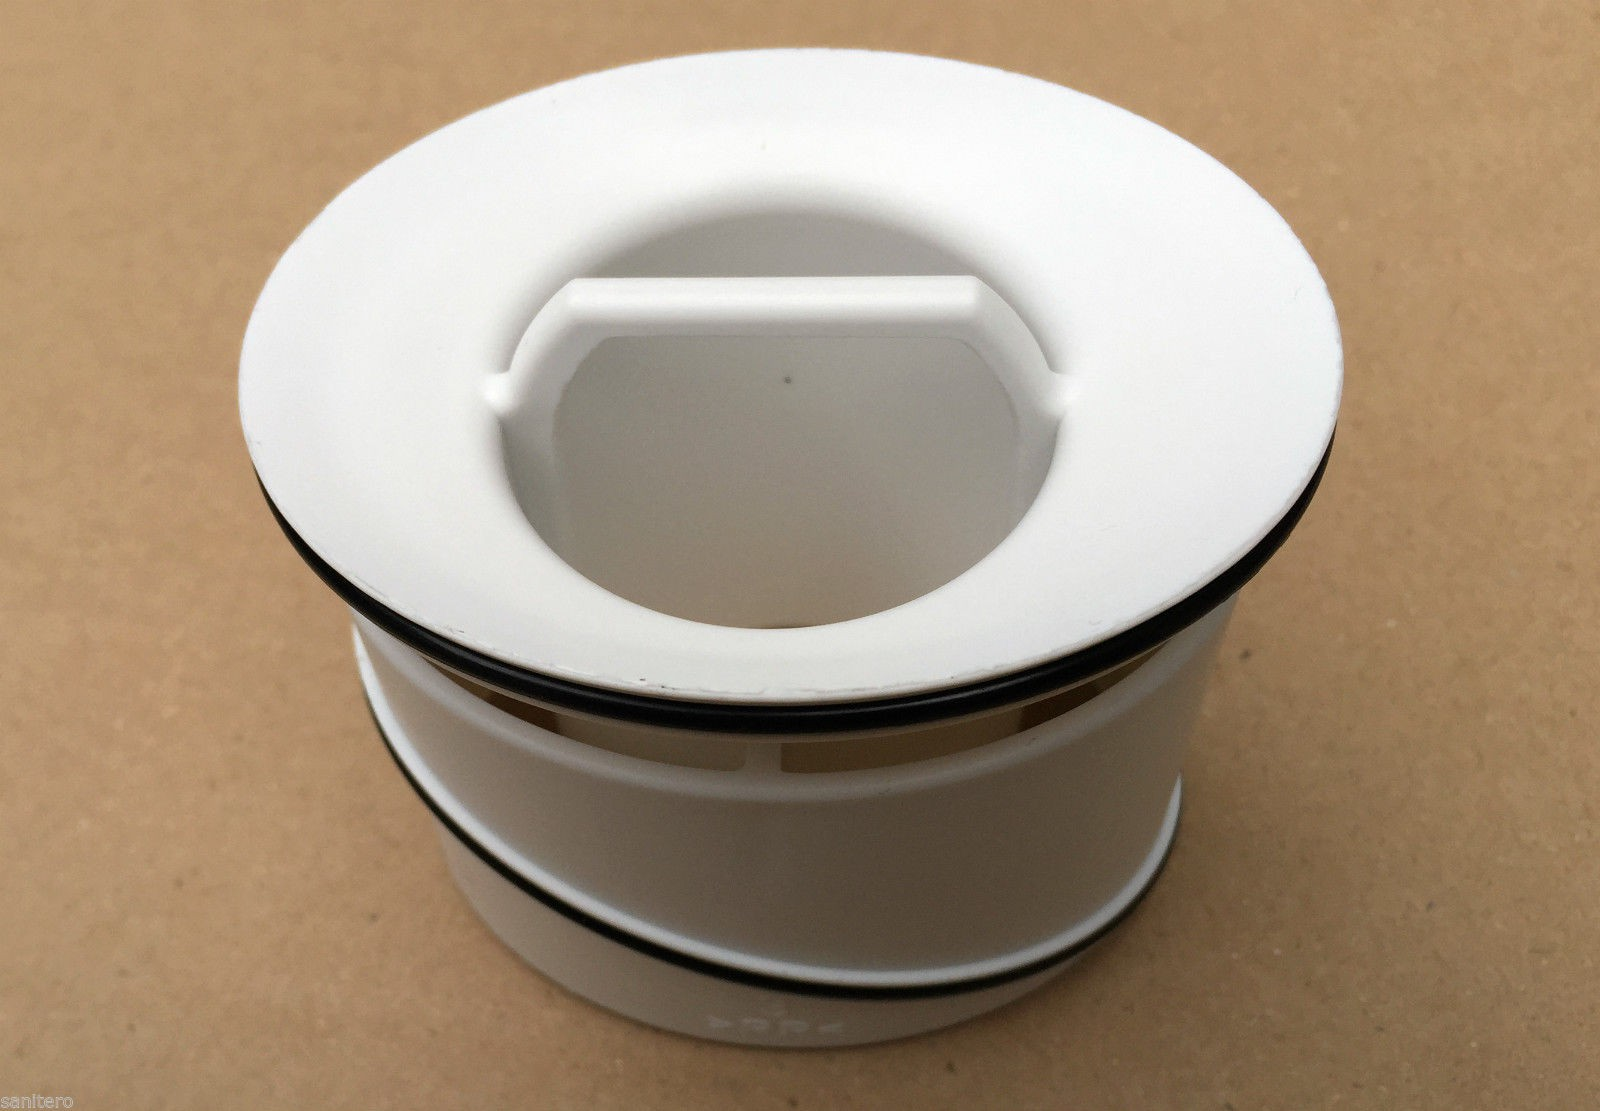 viega tauchrohr duschablauf tempoplex sifon 450229 6958. Black Bedroom Furniture Sets. Home Design Ideas